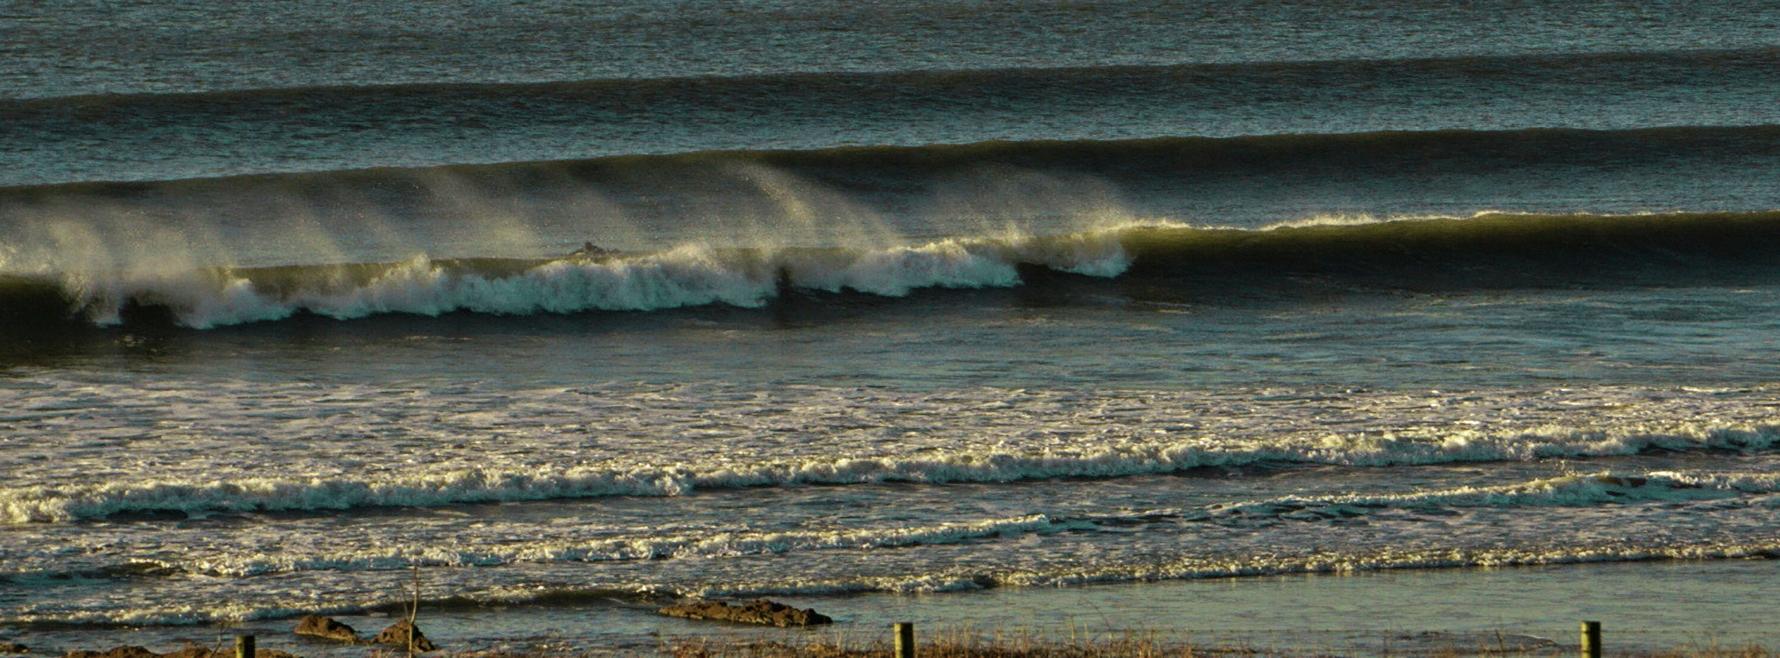 waves bodysurf handplane handplaning bodysurfing hardboard croyde uk surf